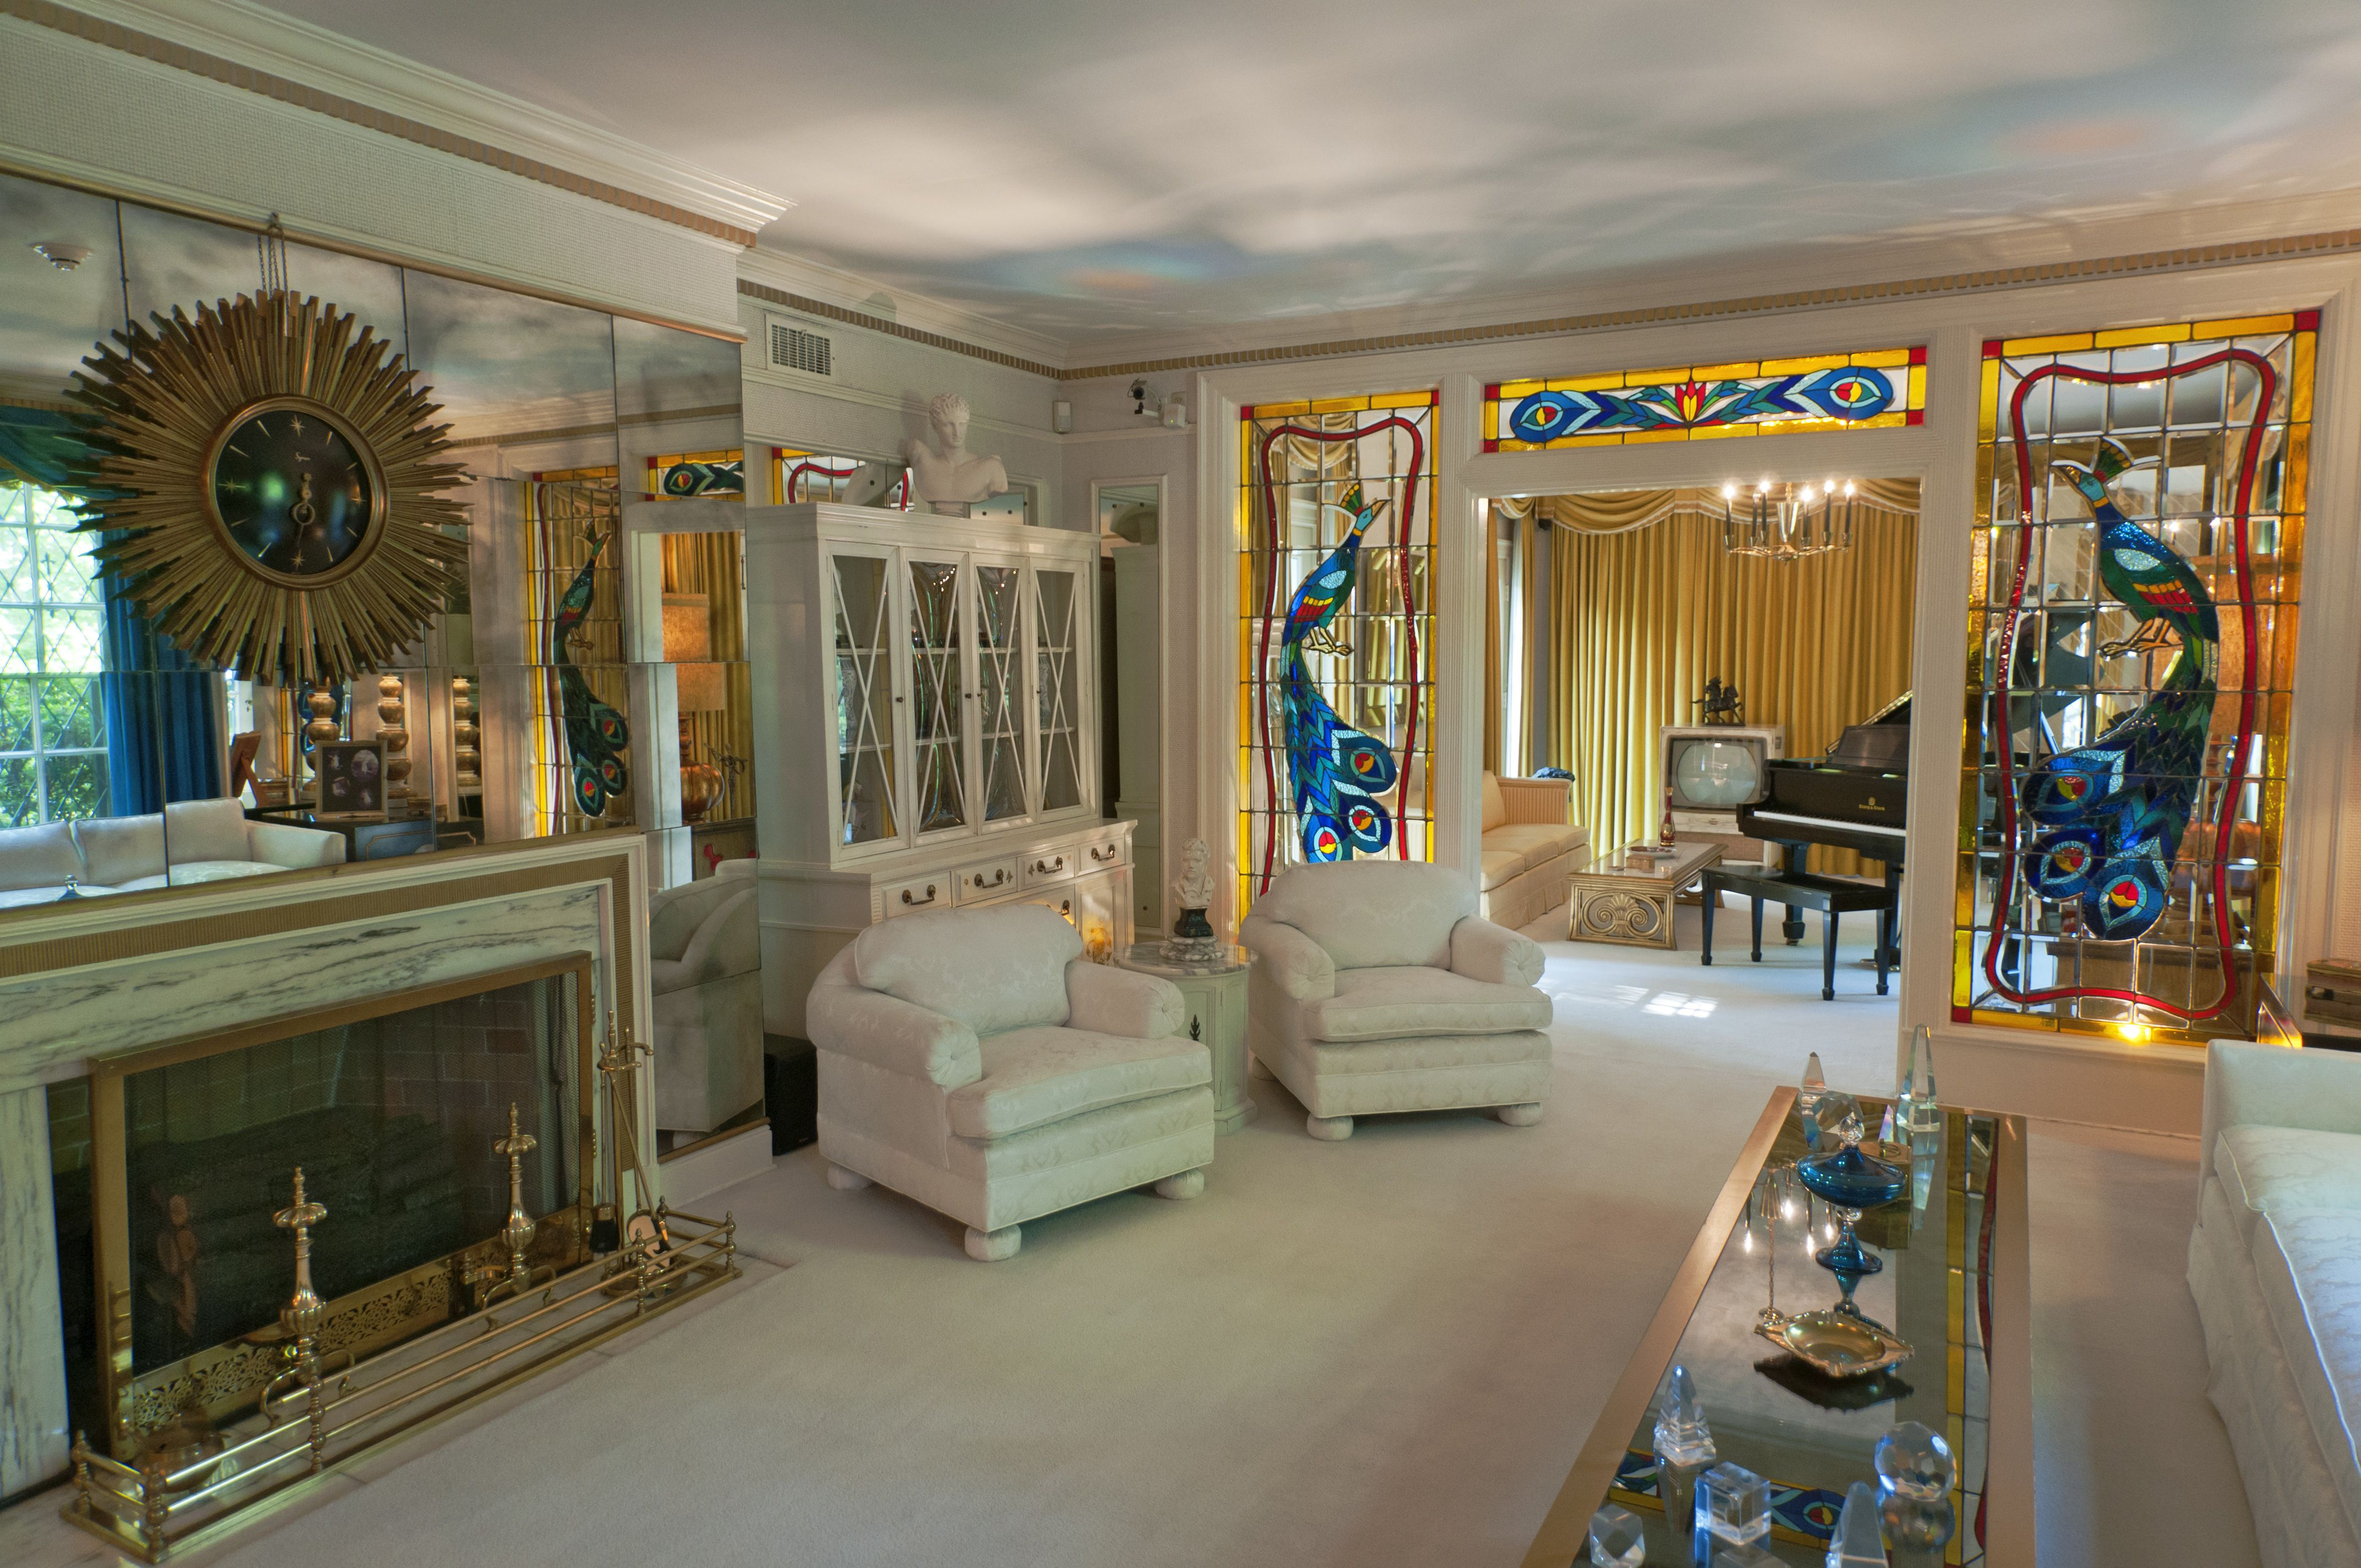 A Look At Graceland Mansion Home Of Elvis